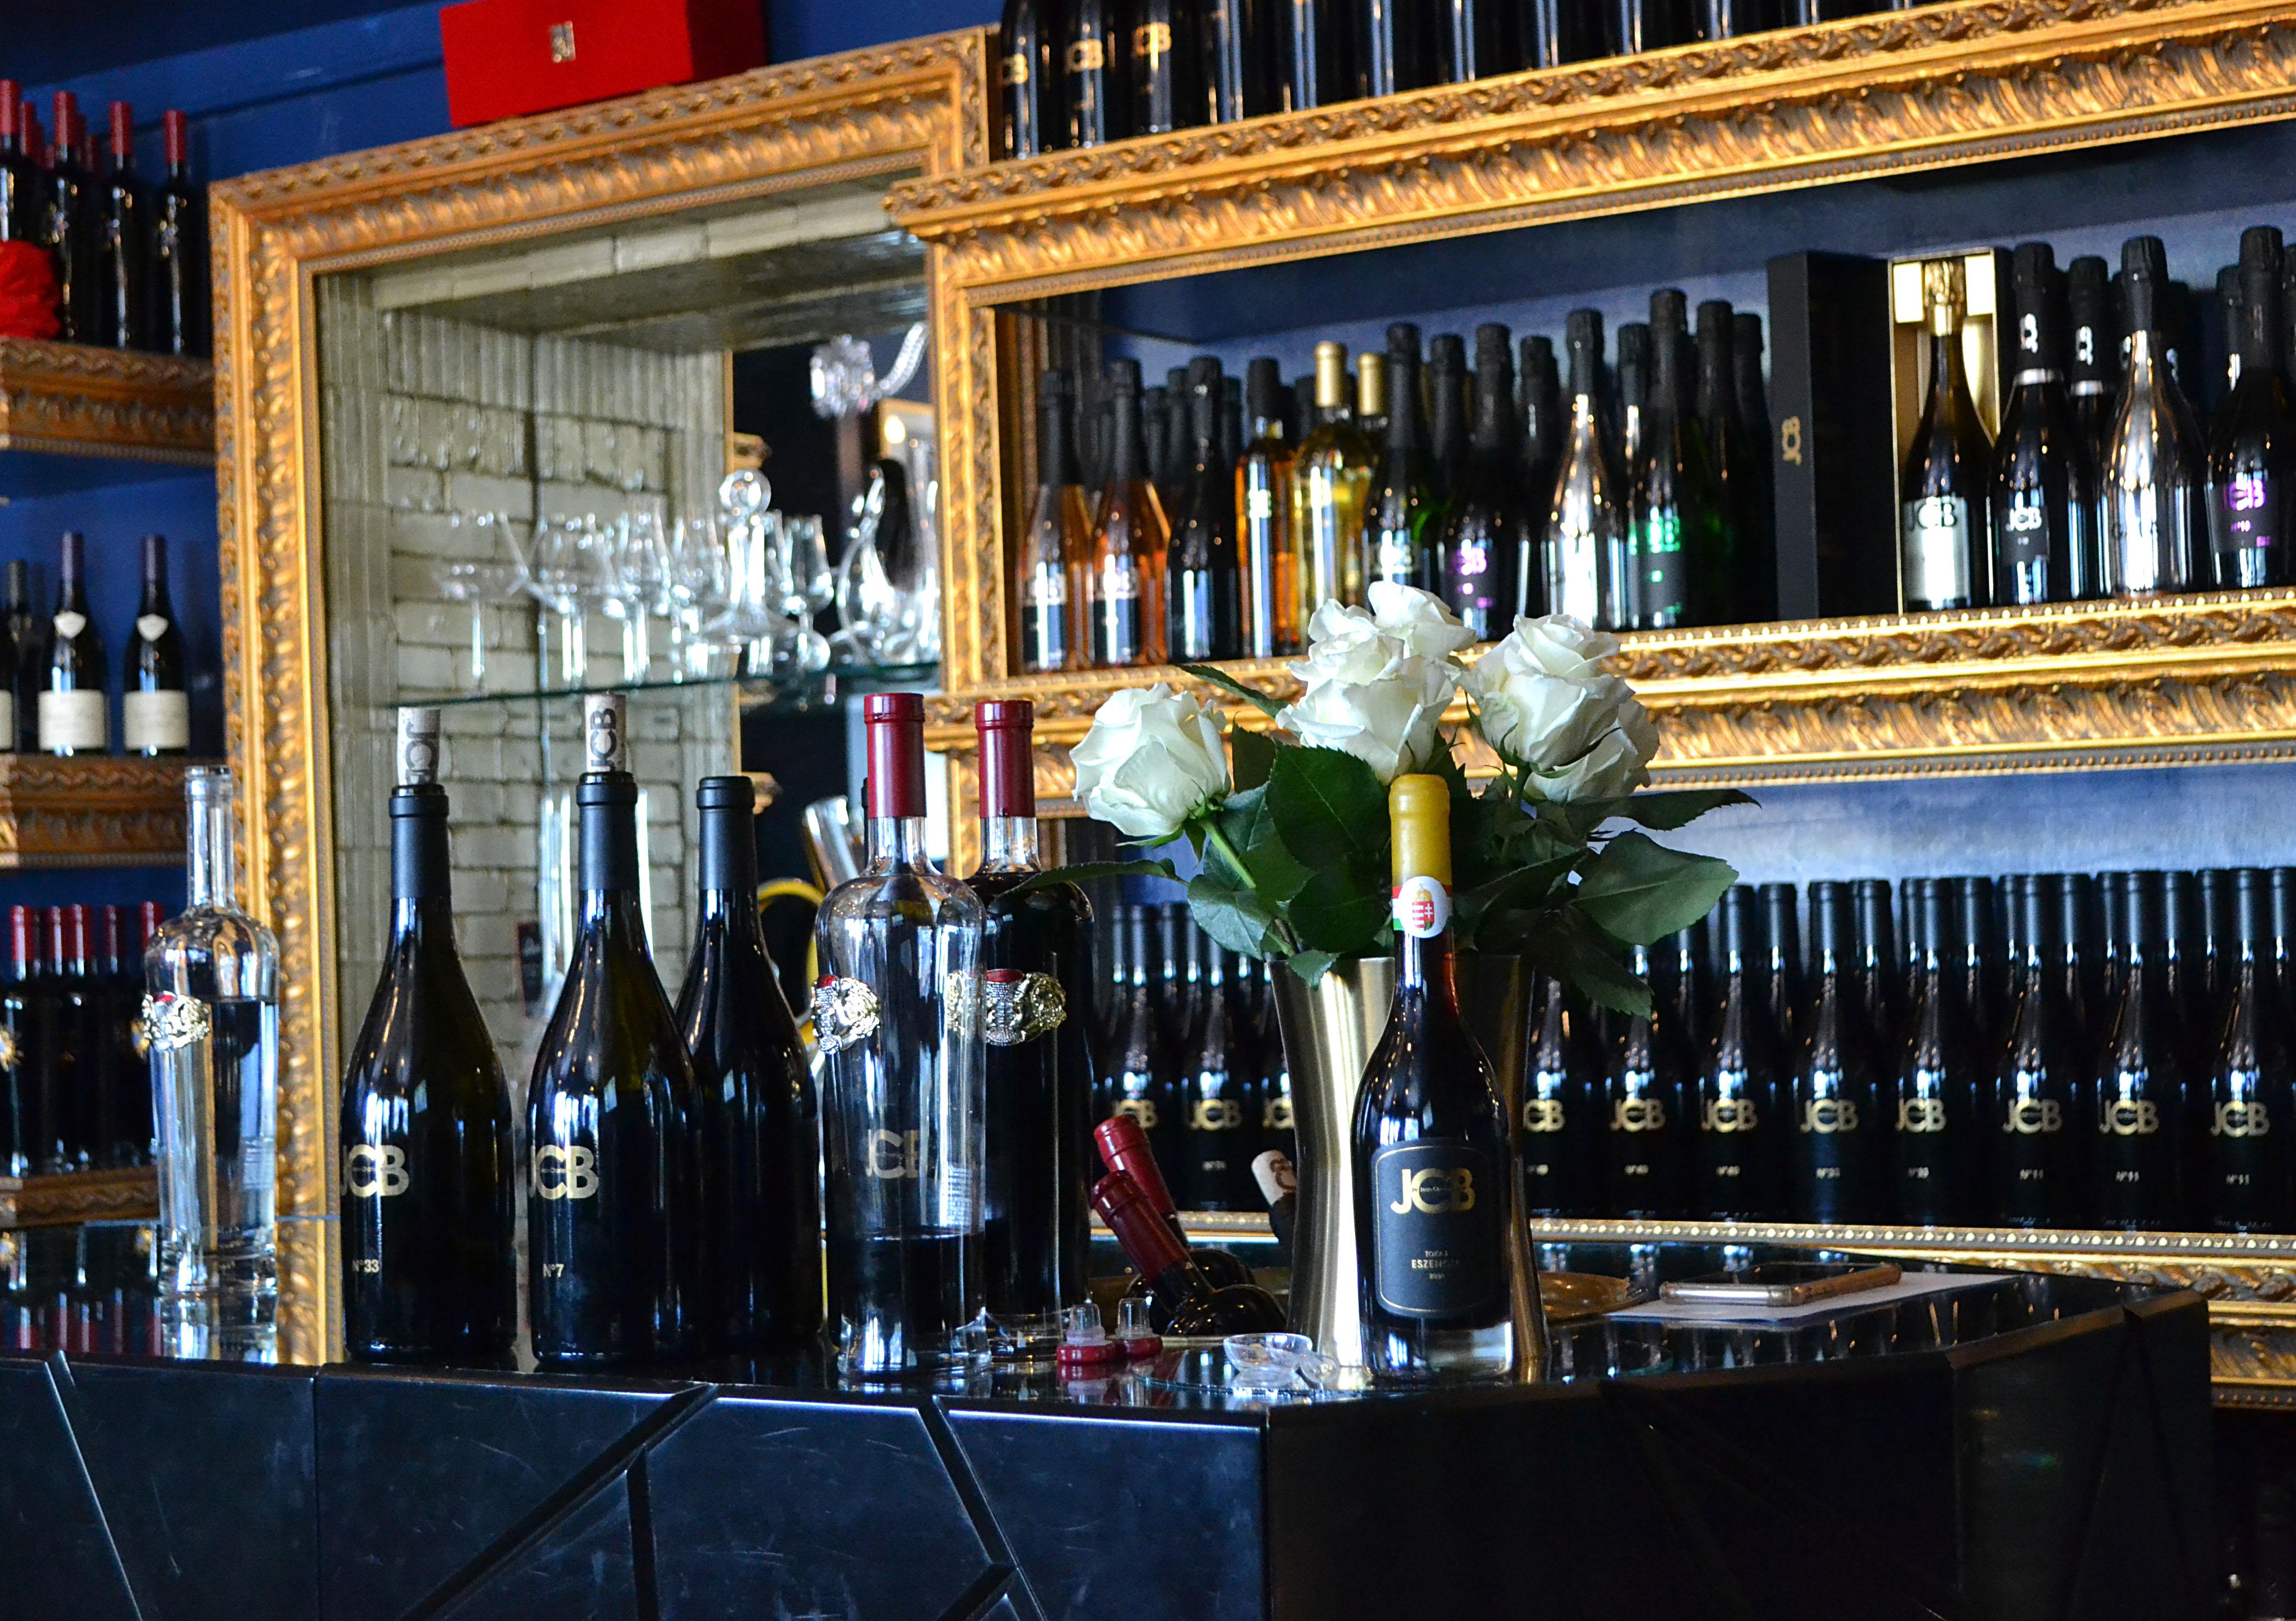 JCB Tasting Salon, Healdsburg, California